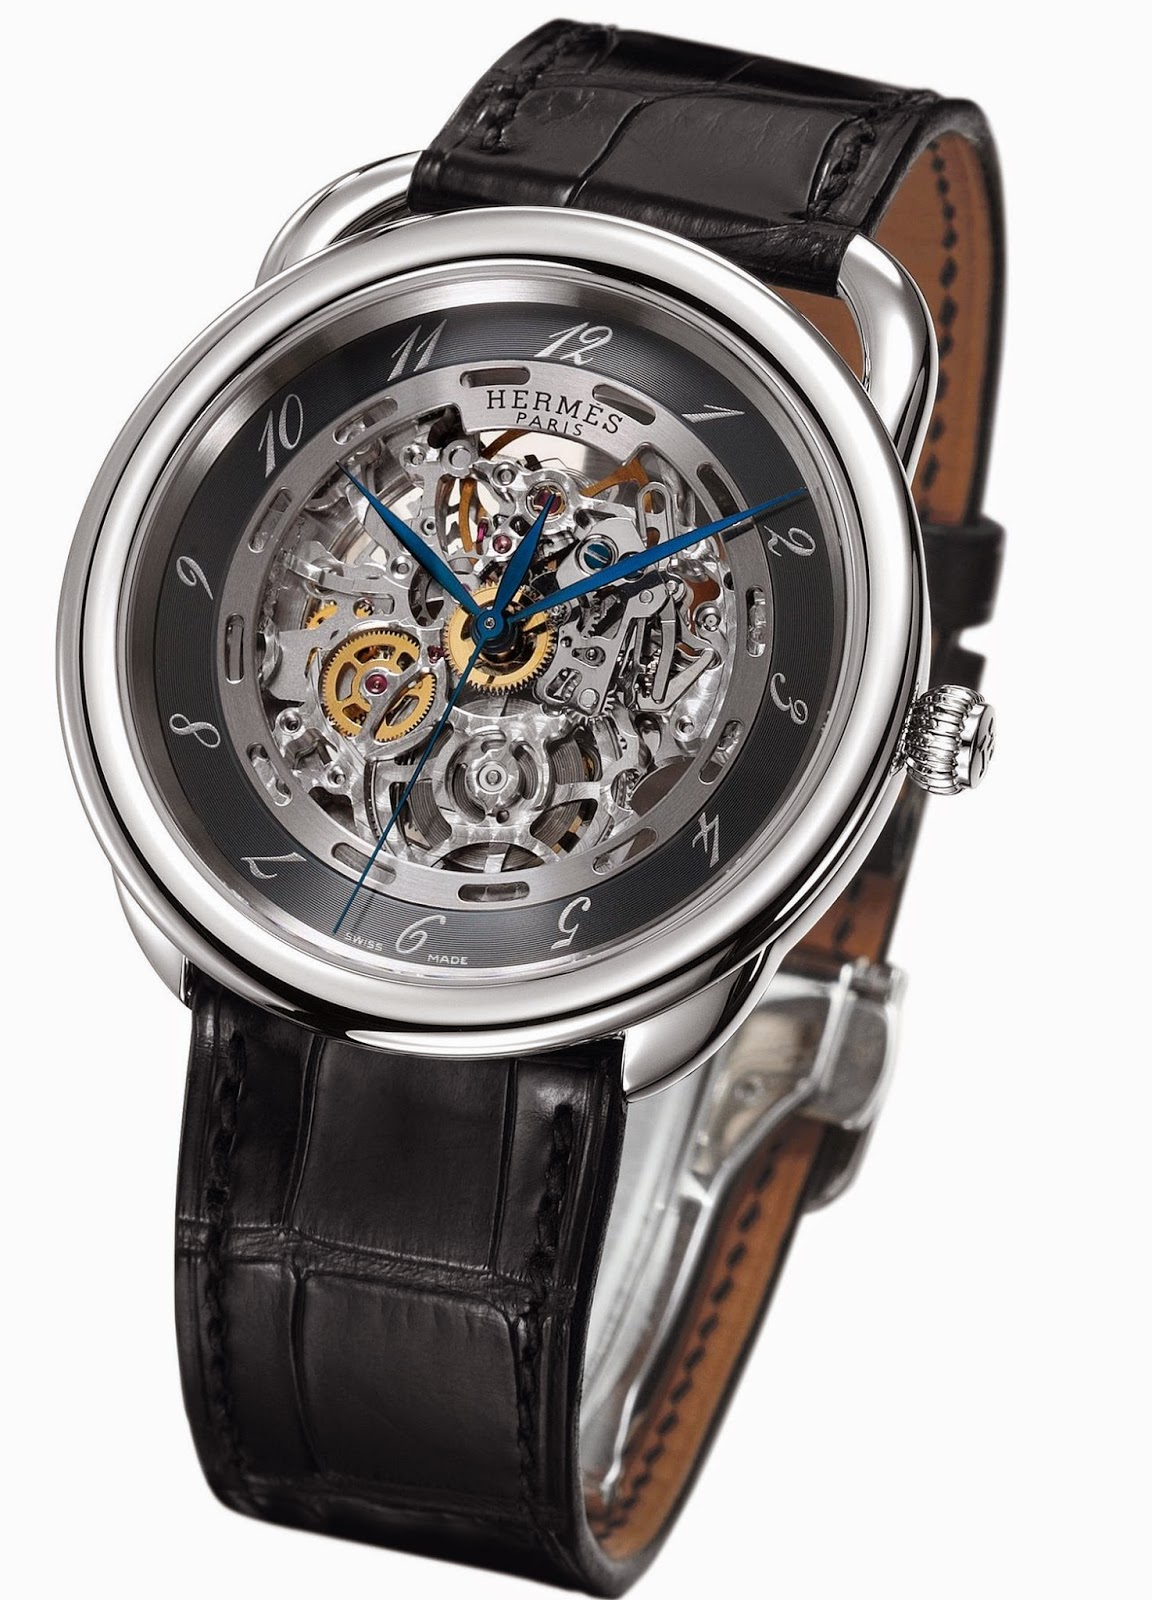 Hermès Arceau Skeleton watch with Steel case